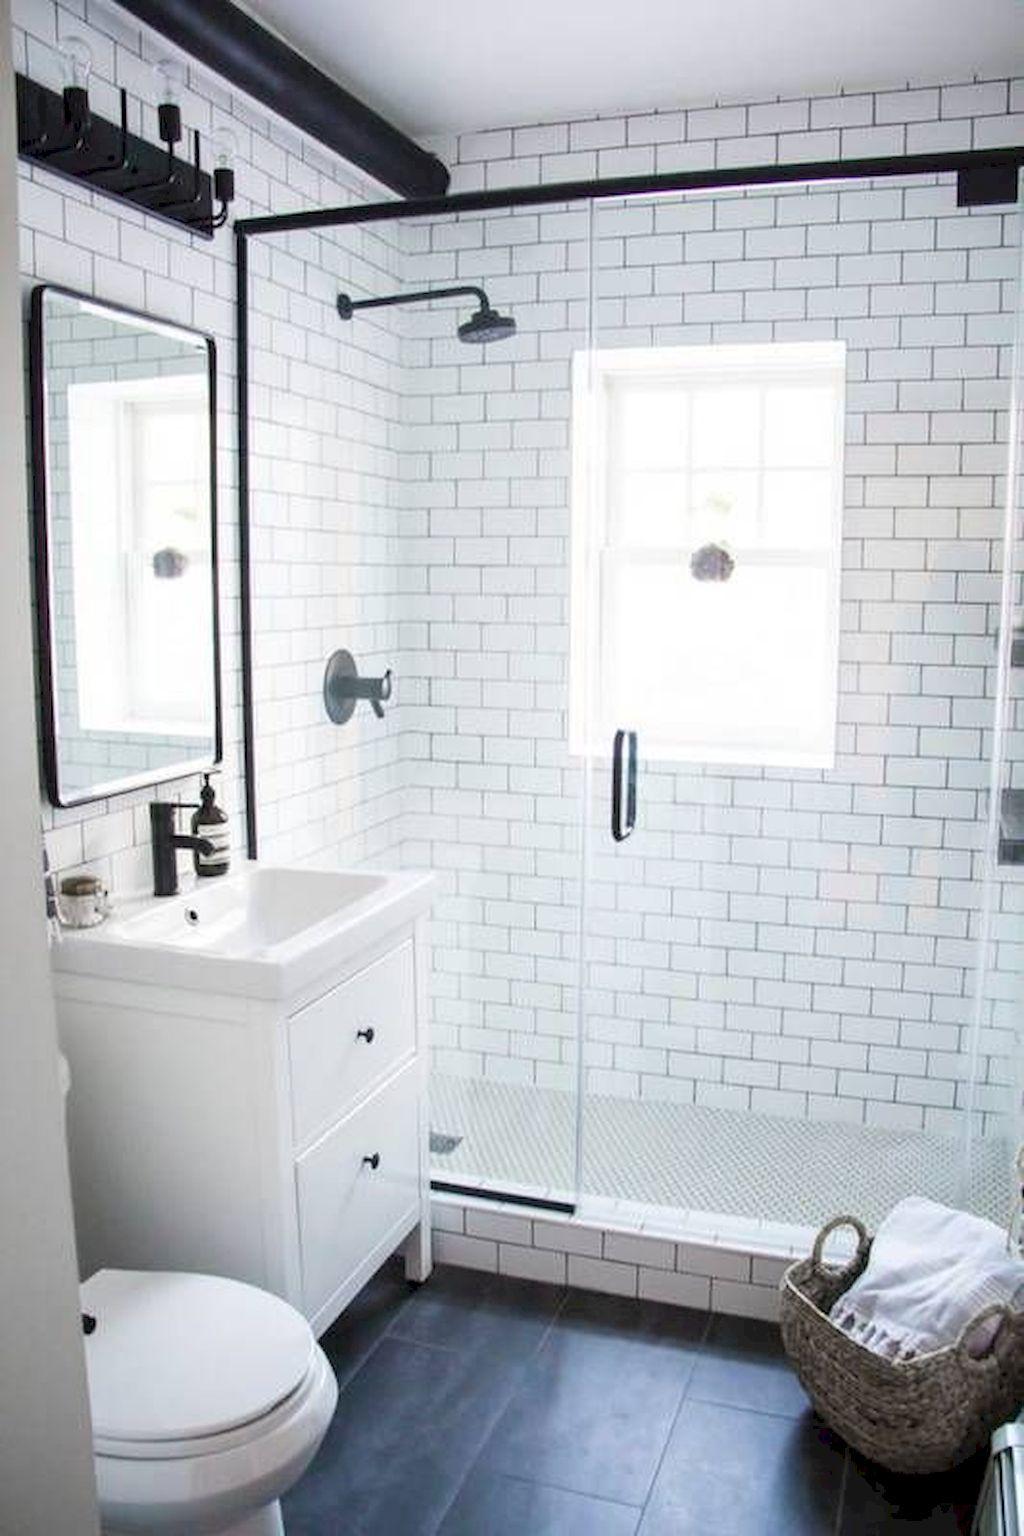 75 Simple Tiny Space Bathroom Ideas on A Budget | Tiny spaces ...